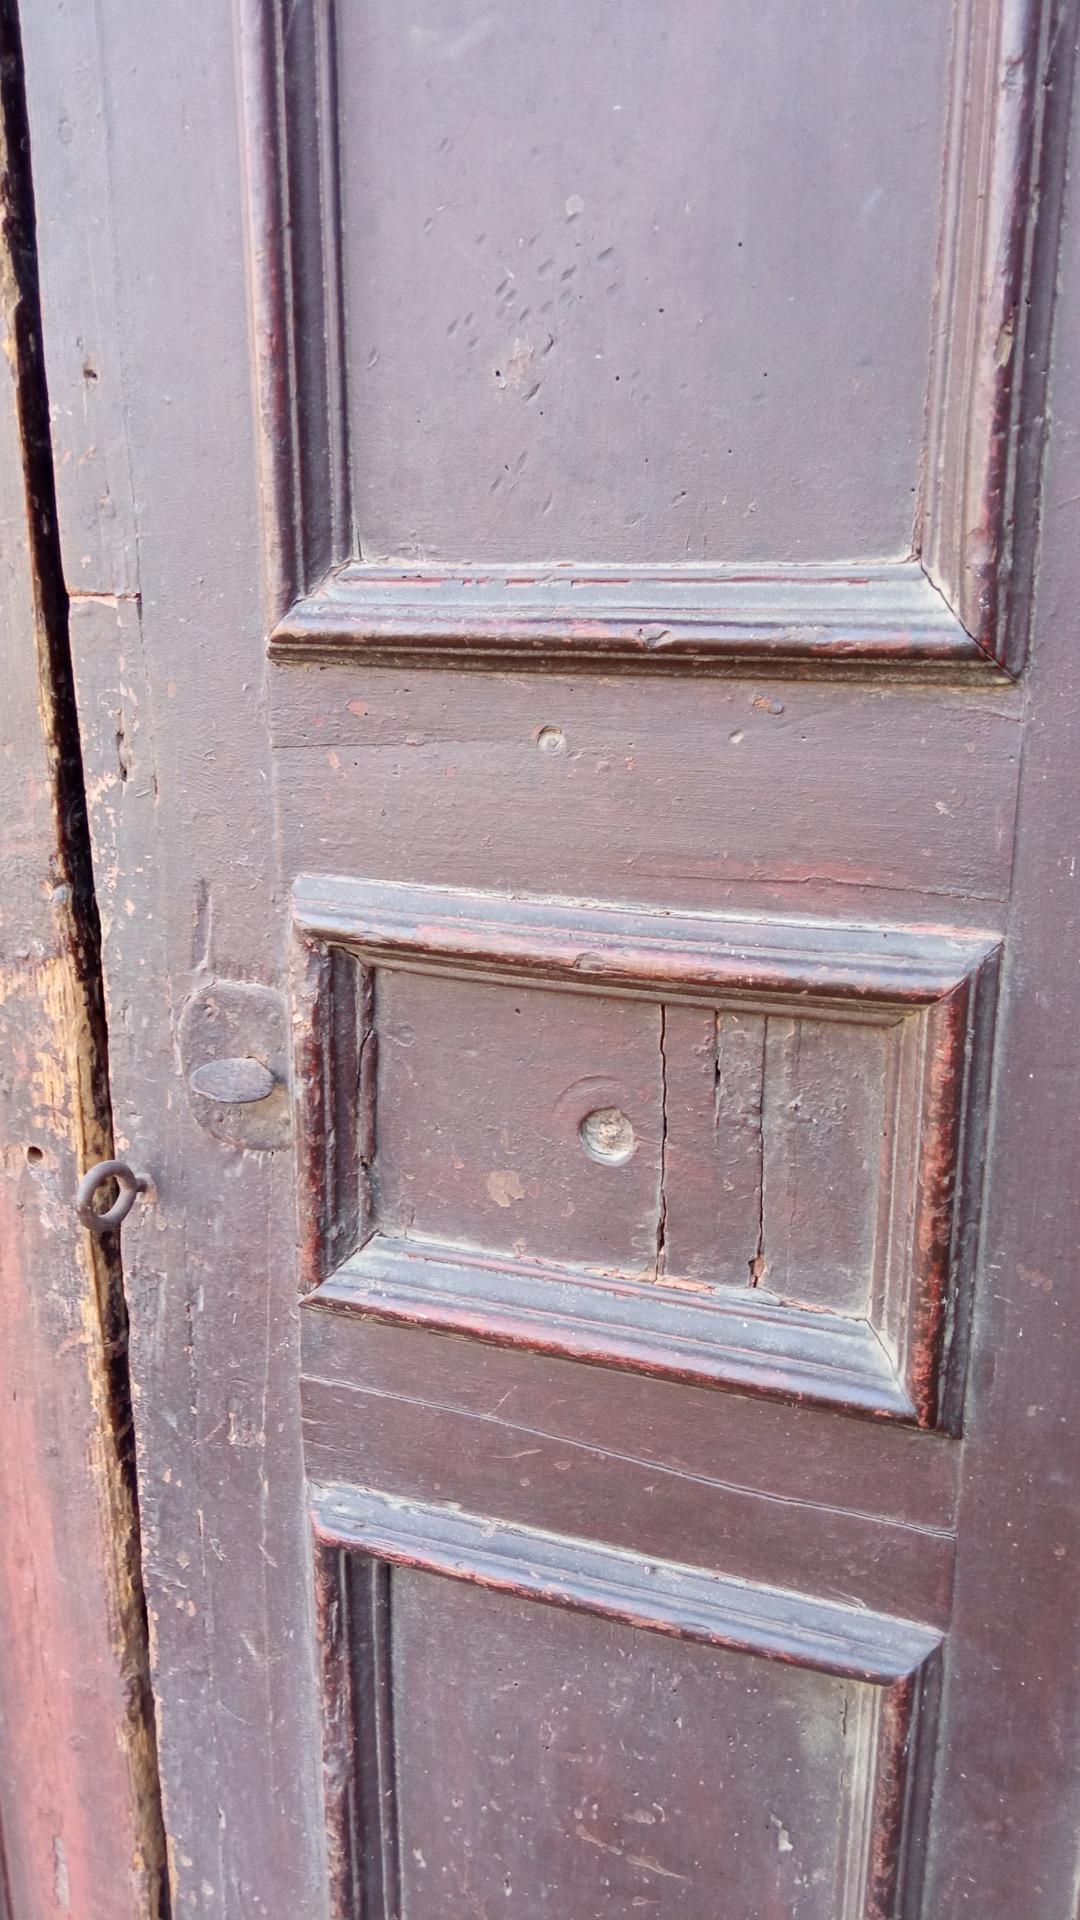 thumb2 2-Blatt-Tür